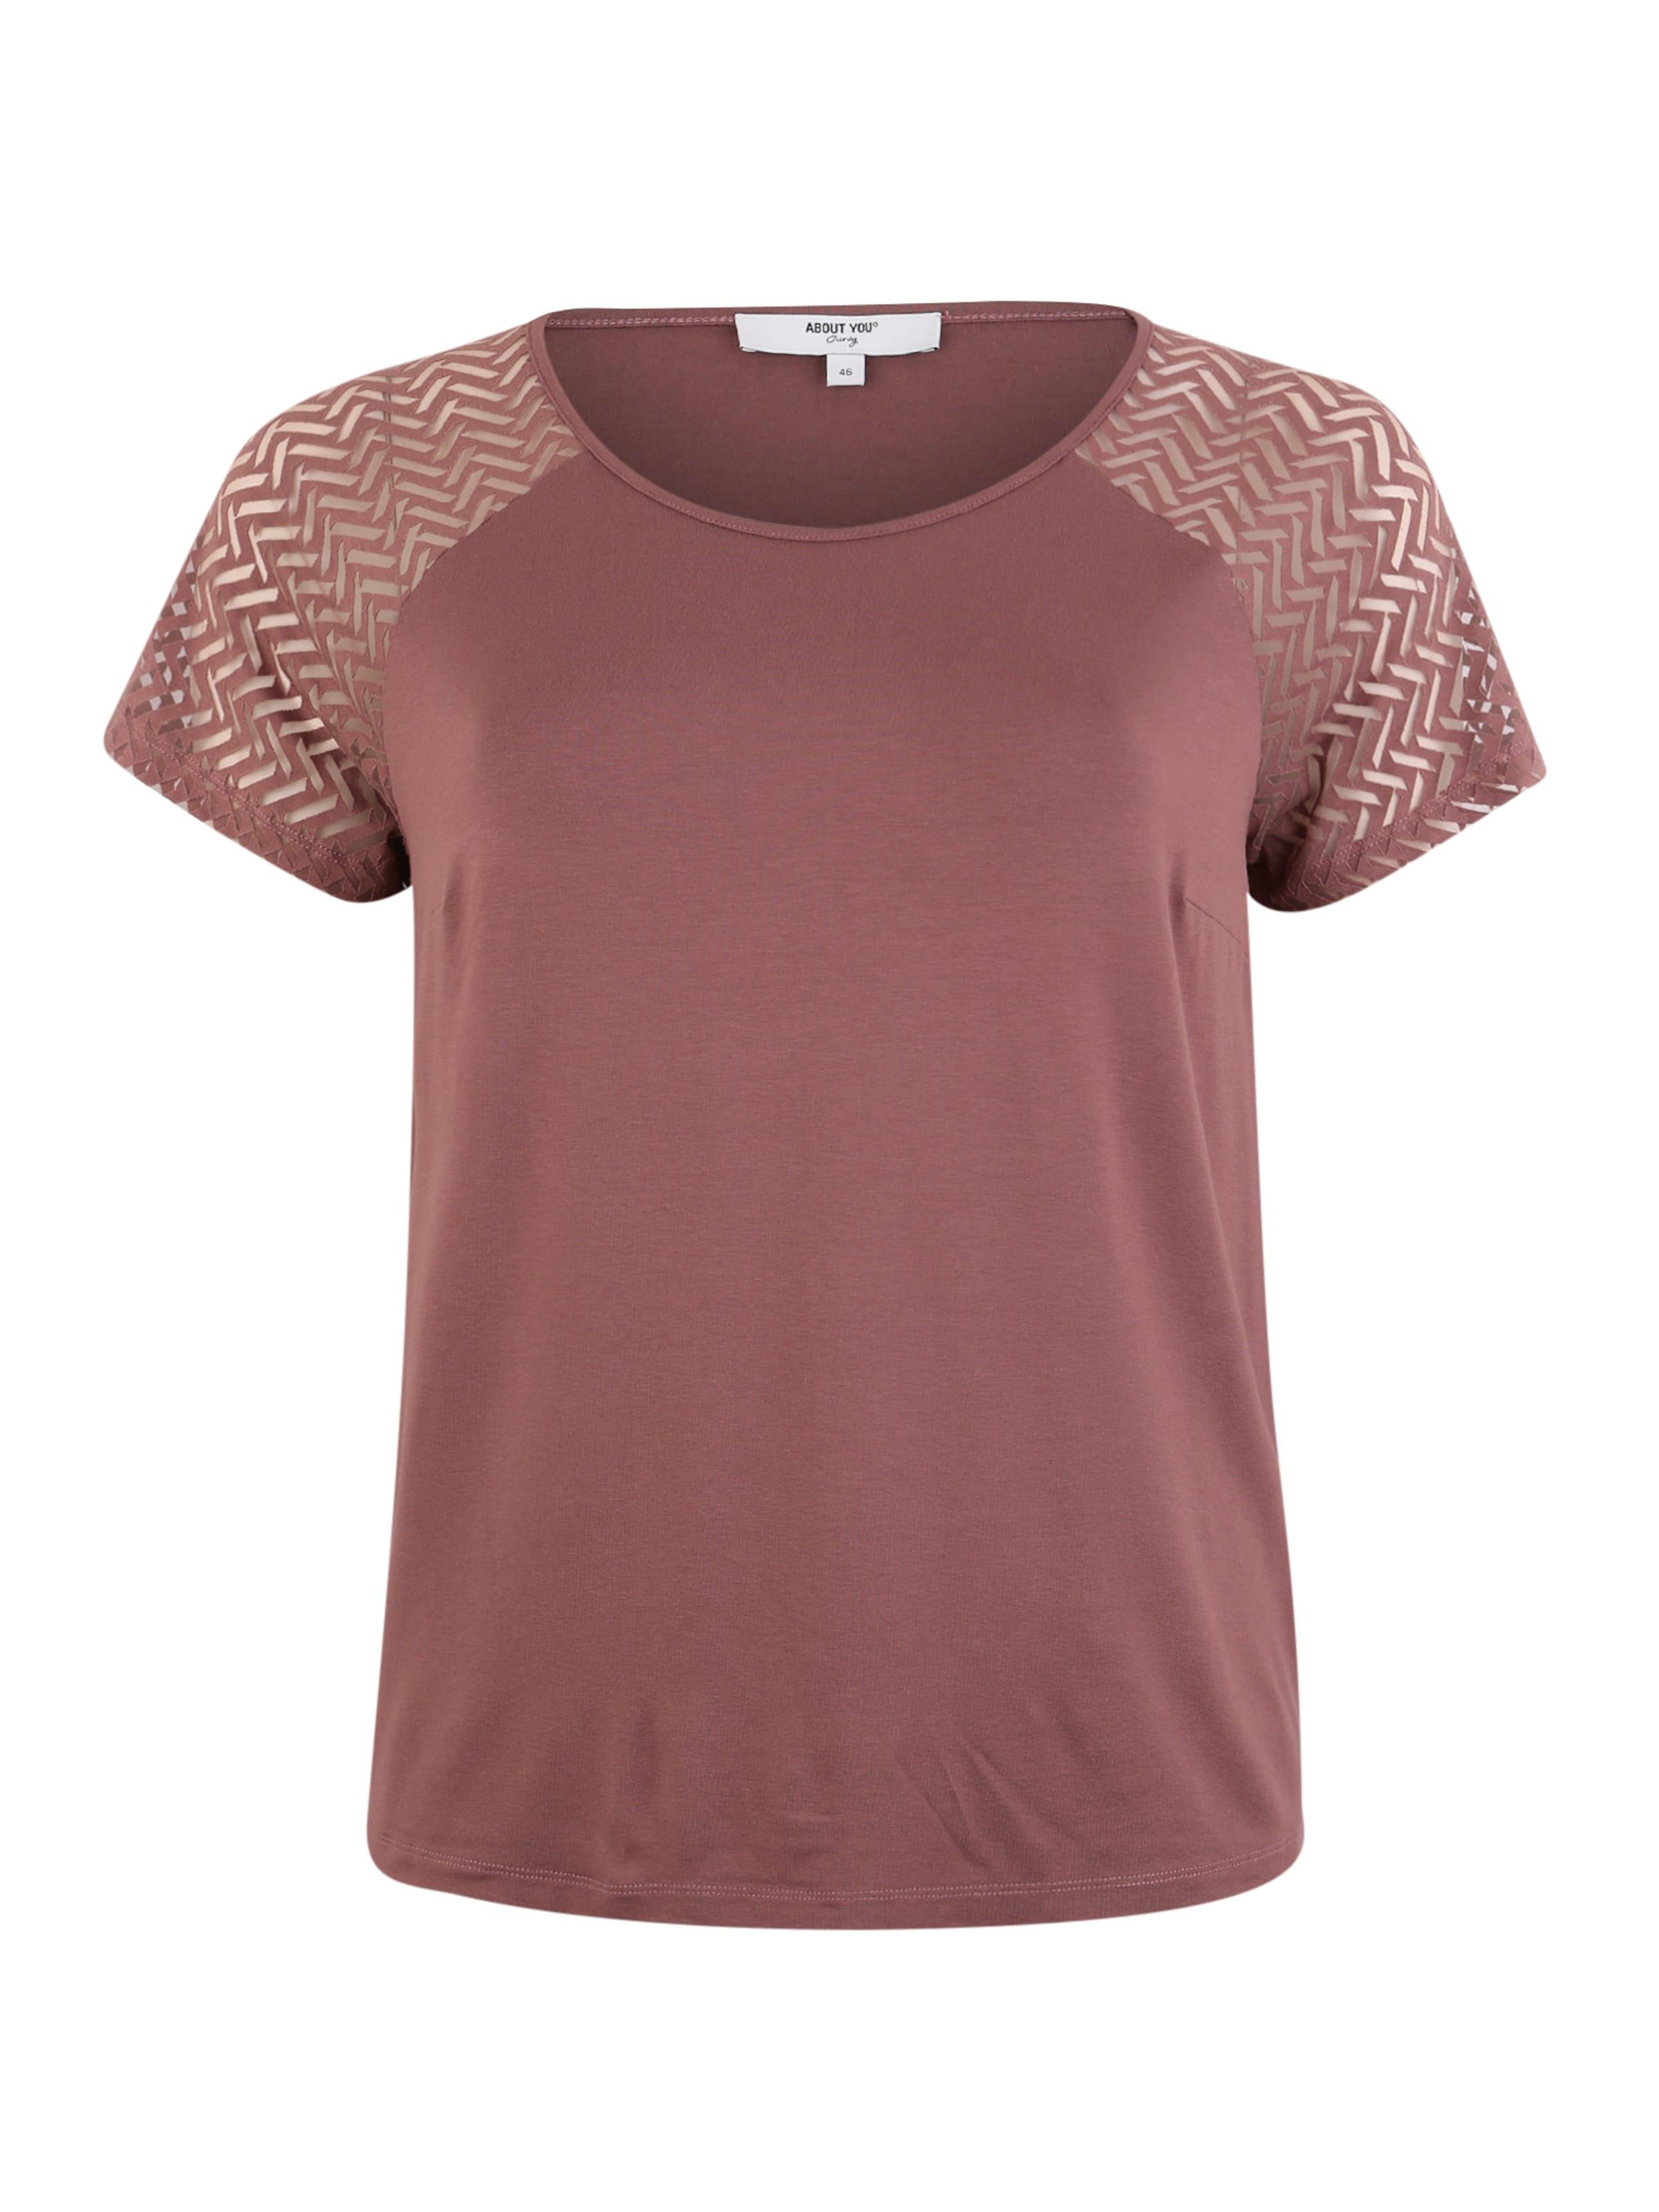 'pina' T You shirt About Curvy Rosé En MqVGLUzpS